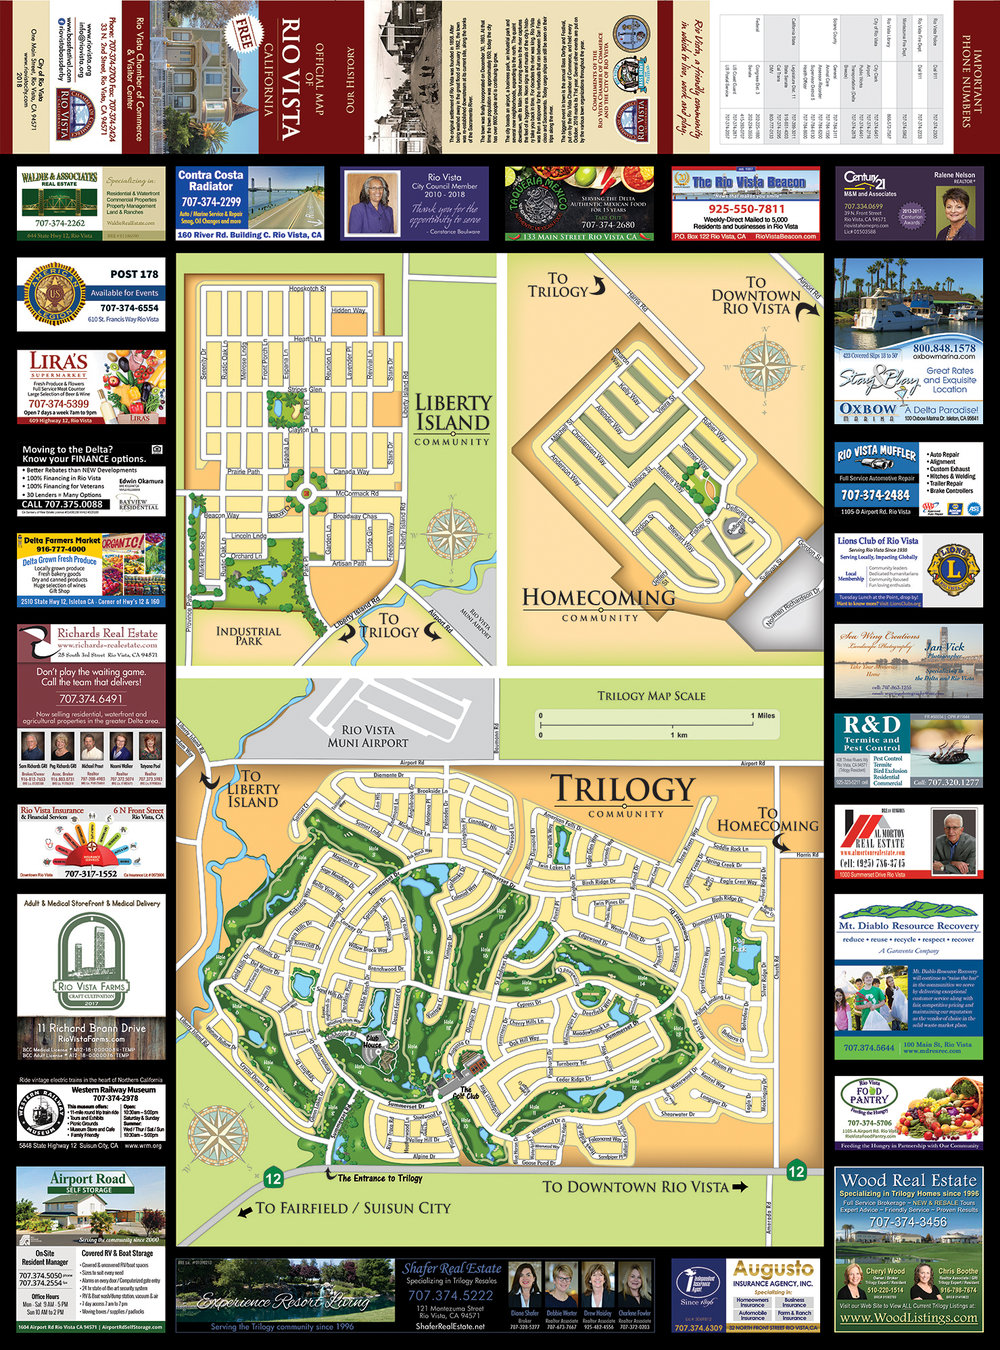 Rio-Vista-Chamber-City-Map-side-2.jpg